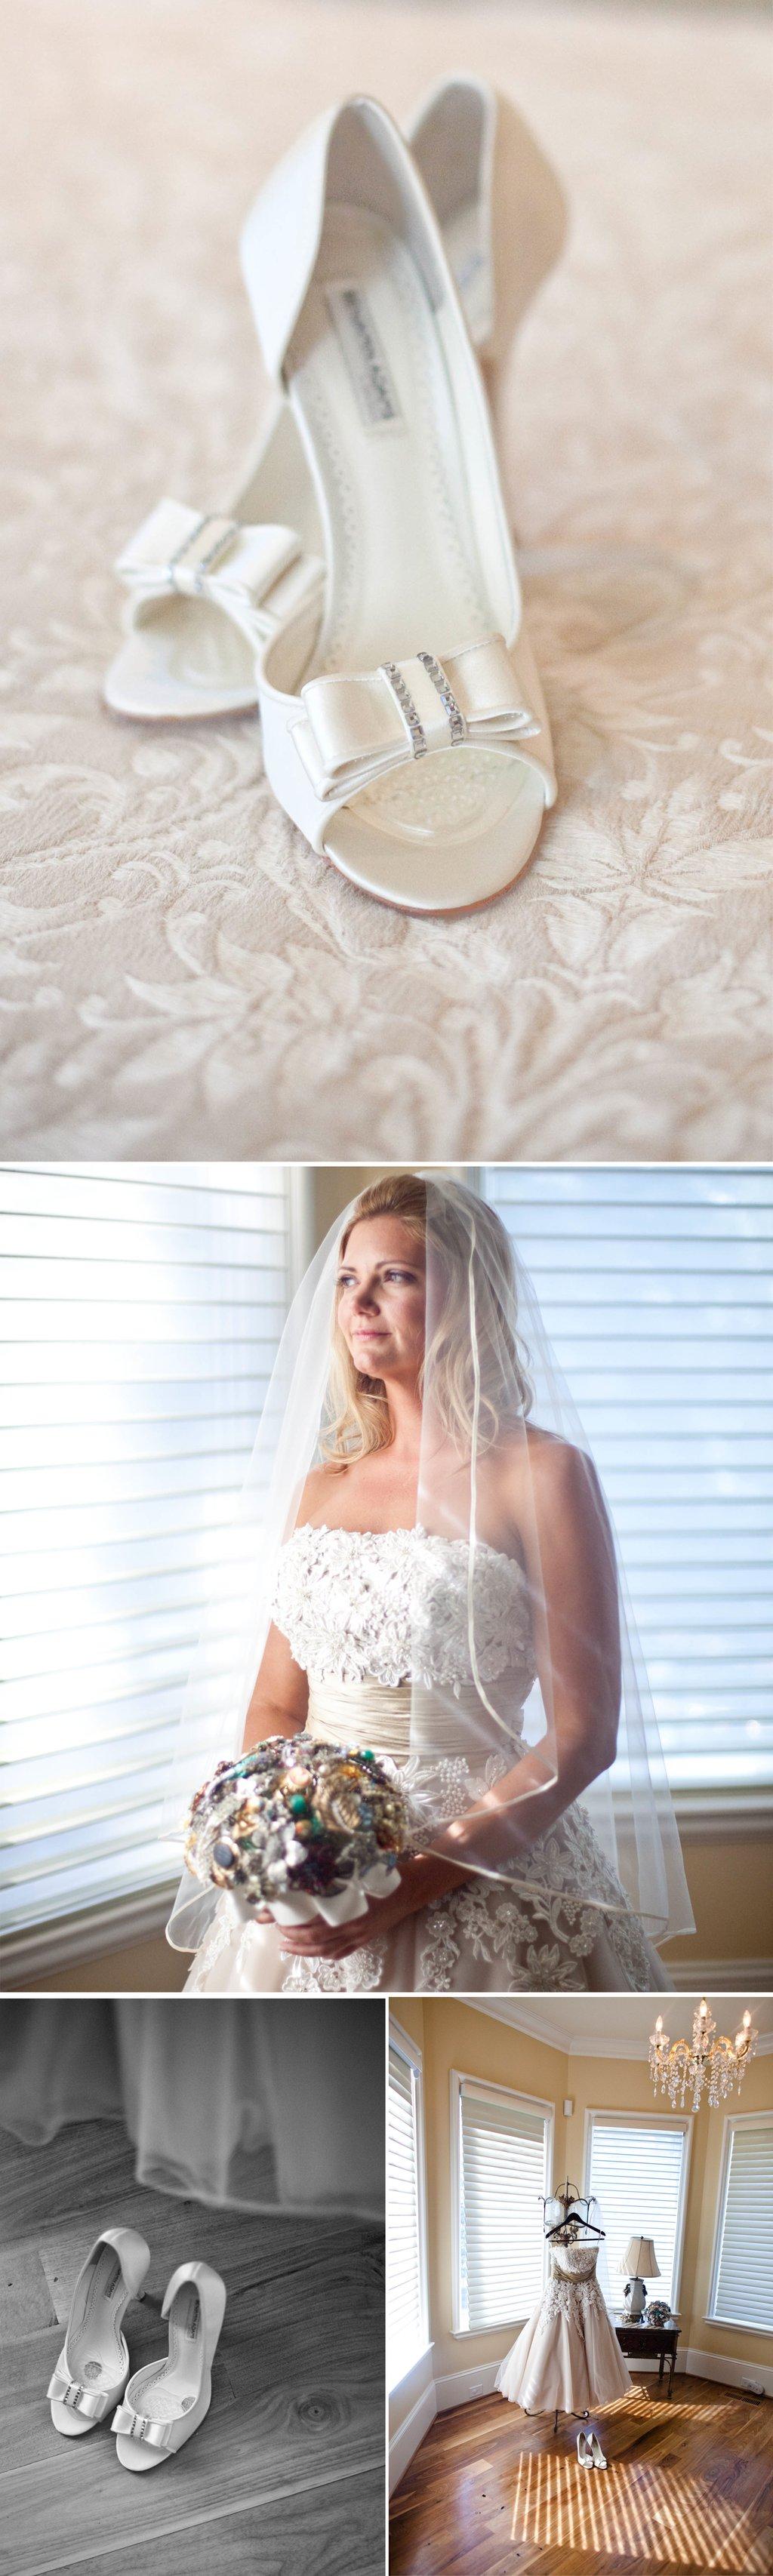 Elegant-bride-vintage-inspired-tea-length-wedding-dress-open-toe-wedding-shoes.full